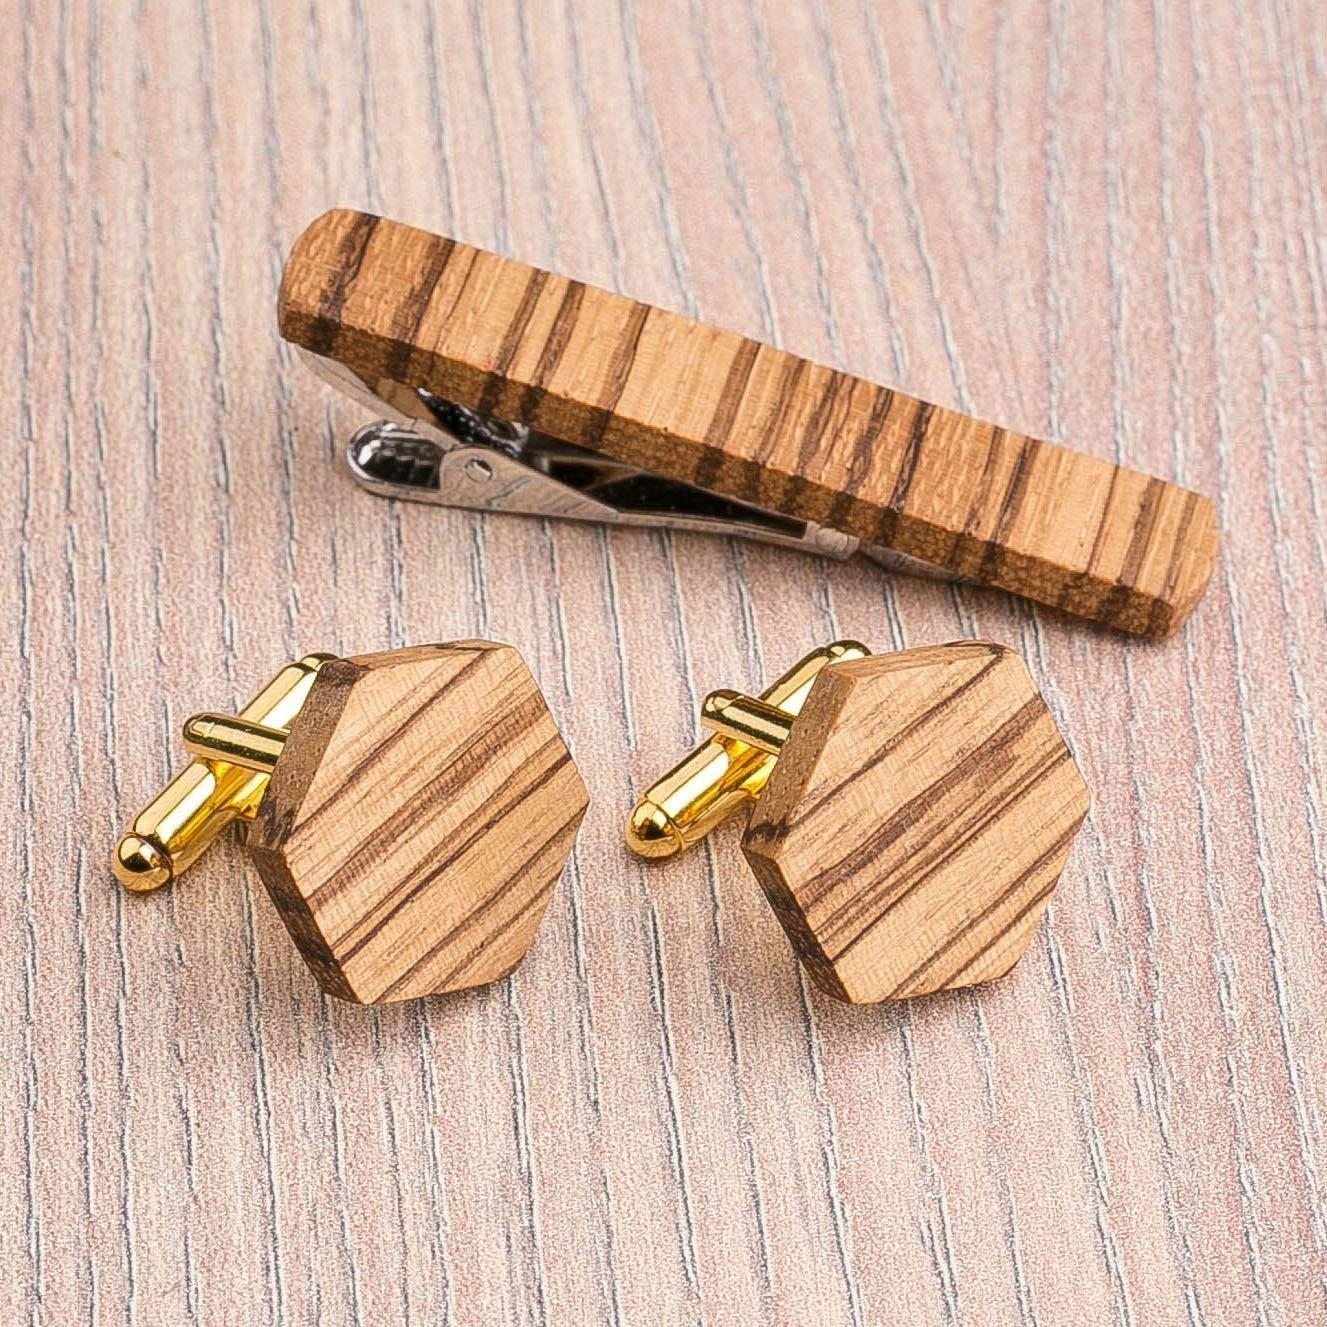 Hexagon Wood Cufflinks and Tie Clip Set. Multicolor Zebrano wood. Custom personalized initial monogram men gift. Engraved jewelry for men. Wedding groomsmen groom gifts. Exclusive Boss gift